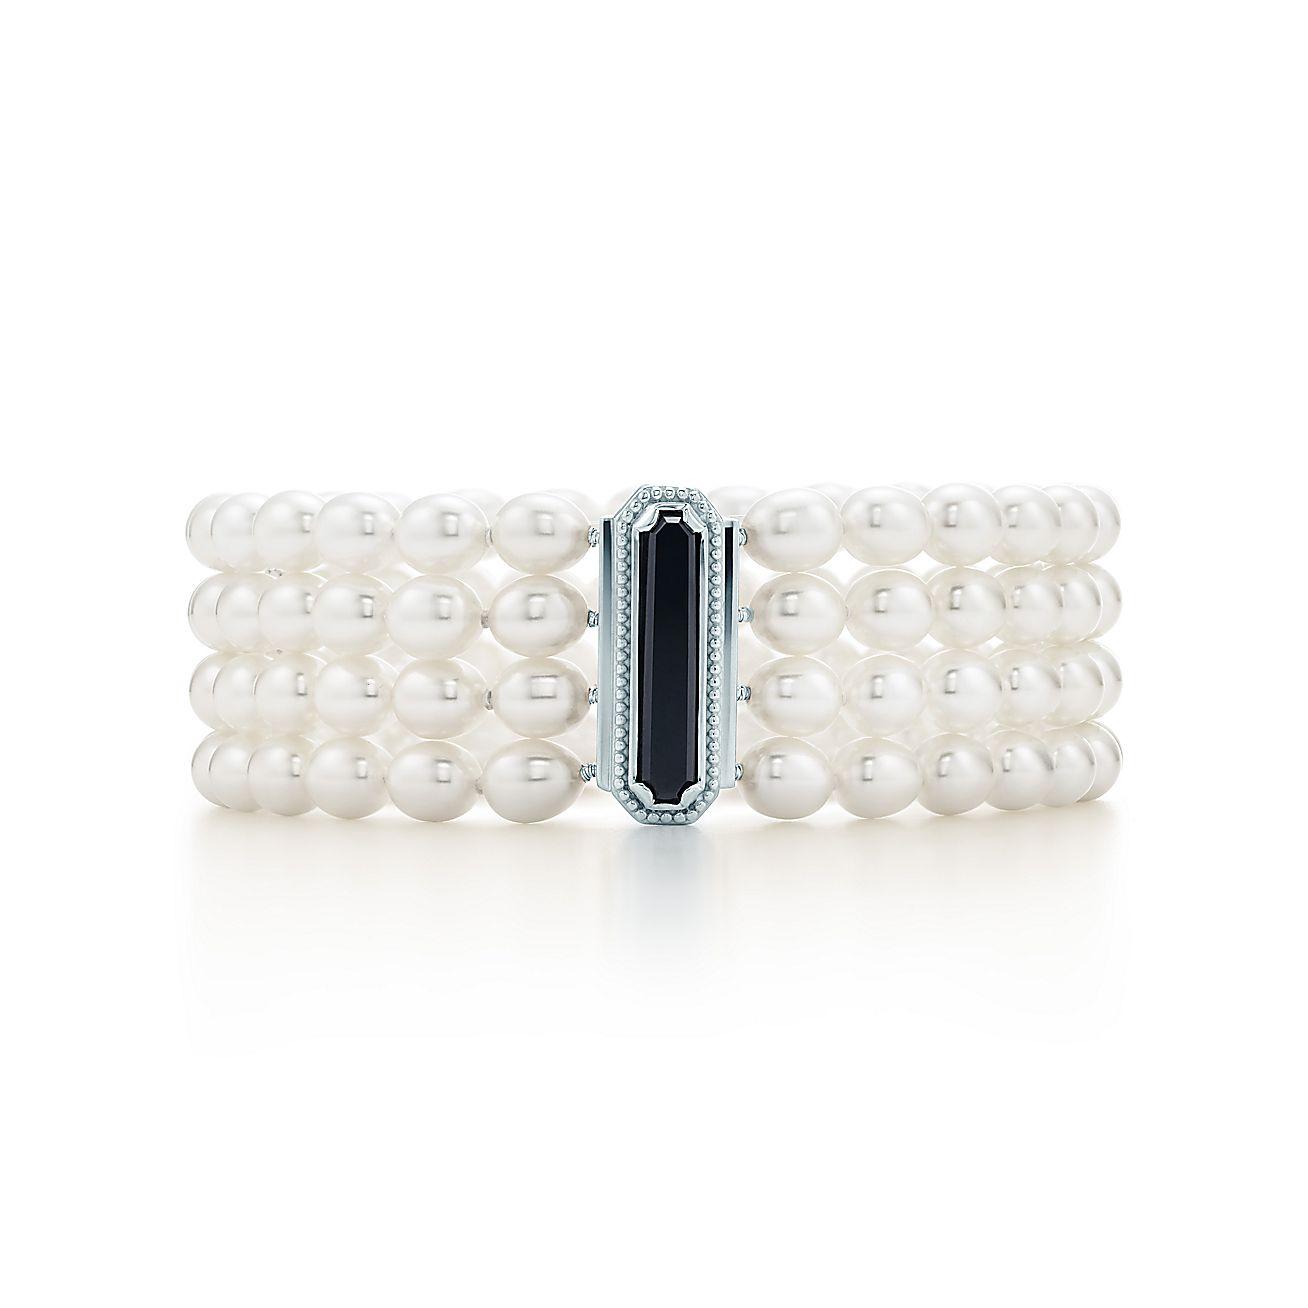 Ziegfeld Collection:Four-row Pearl Bracelet